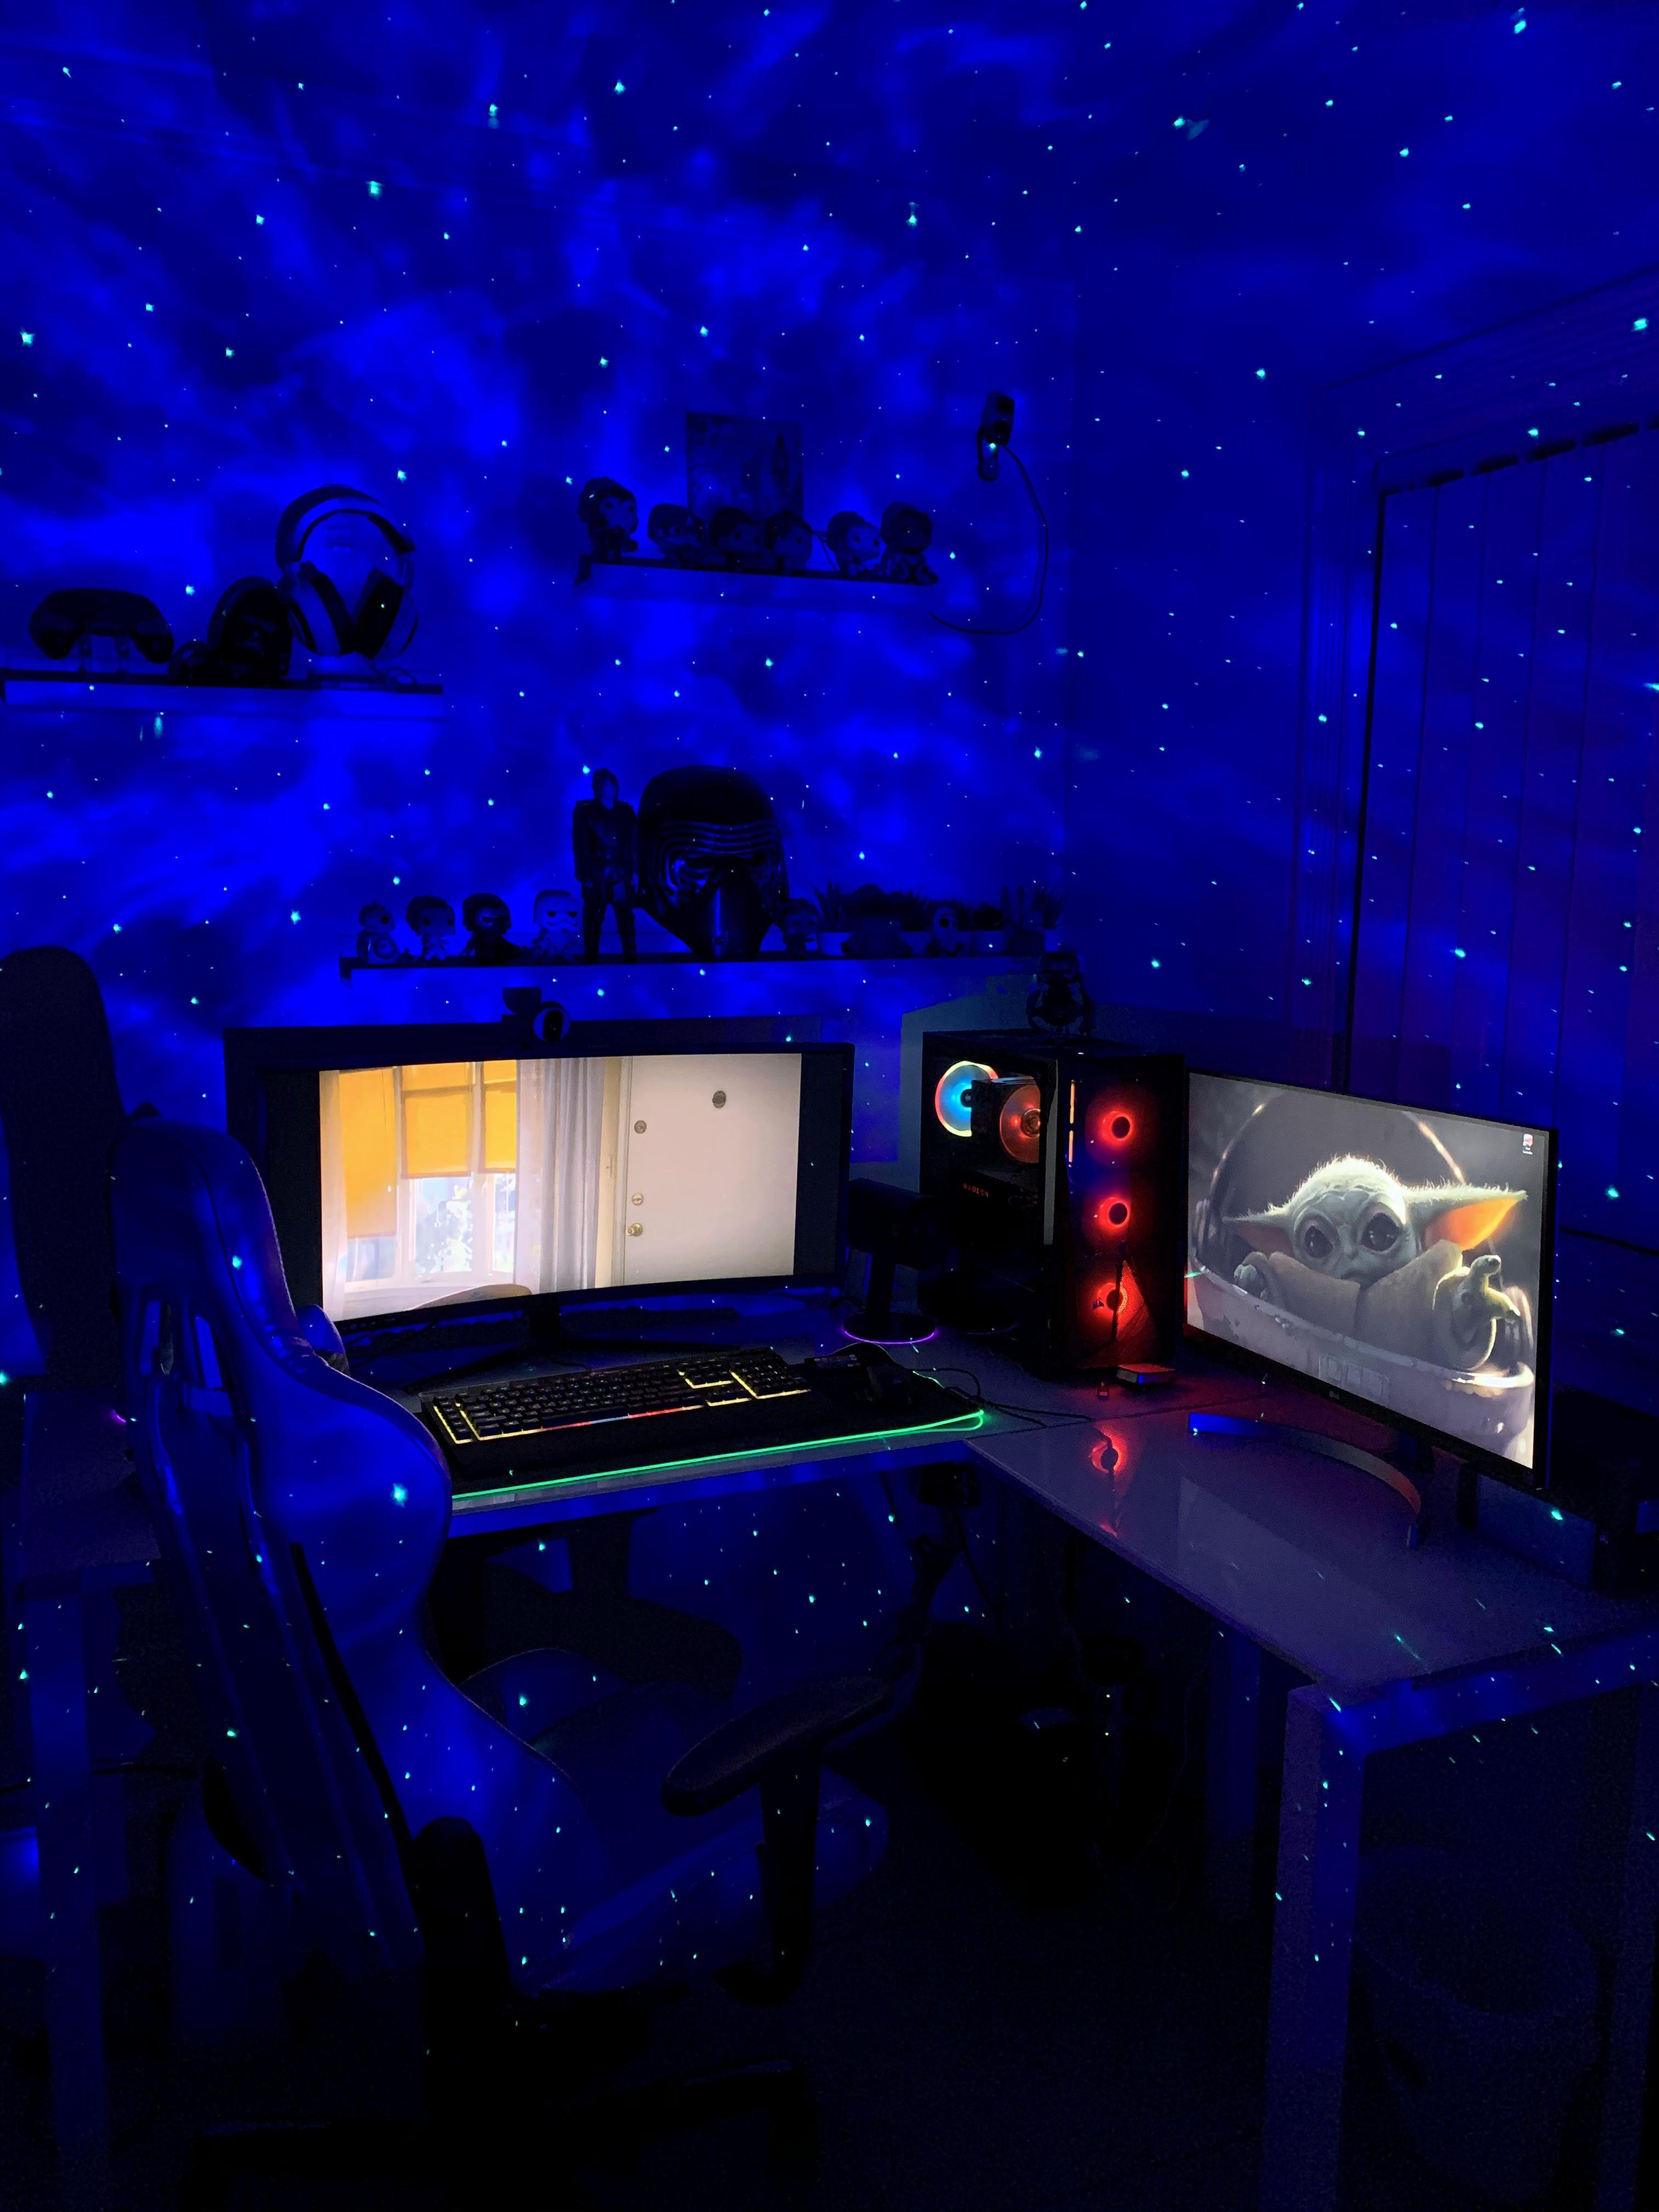 Best Lighting Ever Bedroom Night Light Cool Lighting Gaming Room Setup